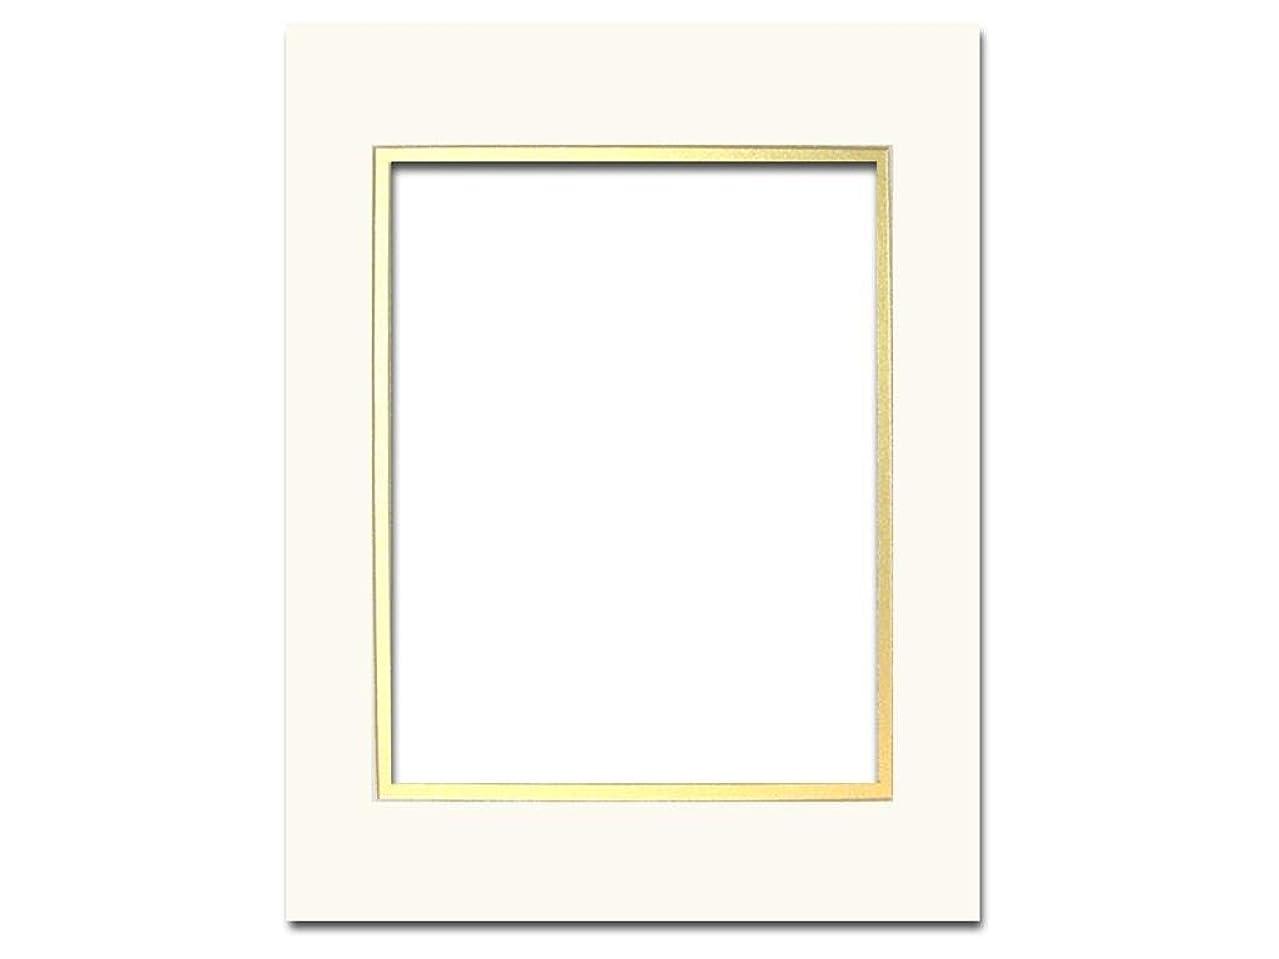 PA Framing ADF93308 ADF Mat Dbl 11x14/8x10 CrmCore Ivory/Gold